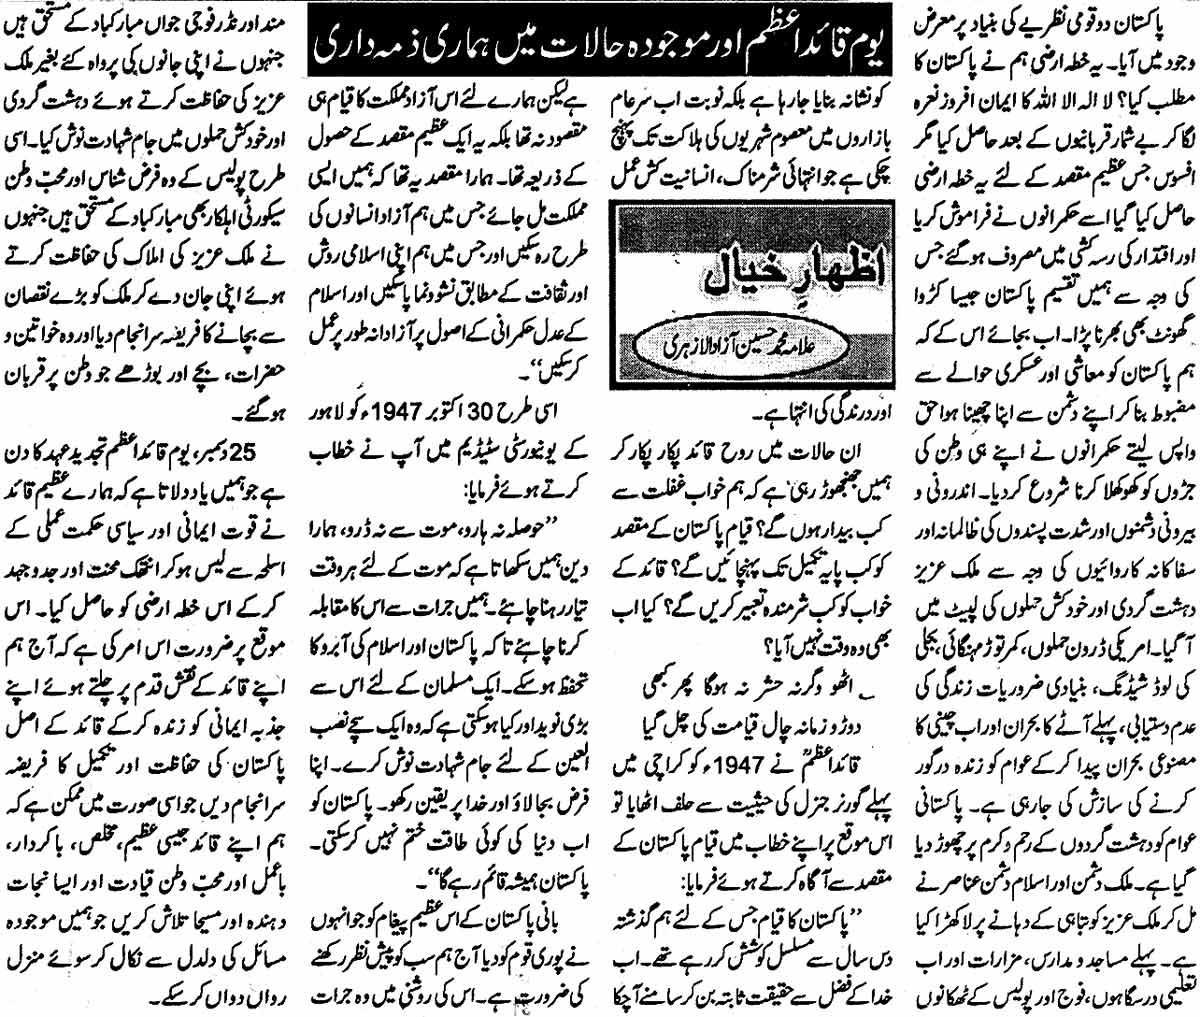 تحریک منہاج القرآن Minhaj-ul-Quran  Print Media Coverage پرنٹ میڈیا کوریج Daily Muashrat